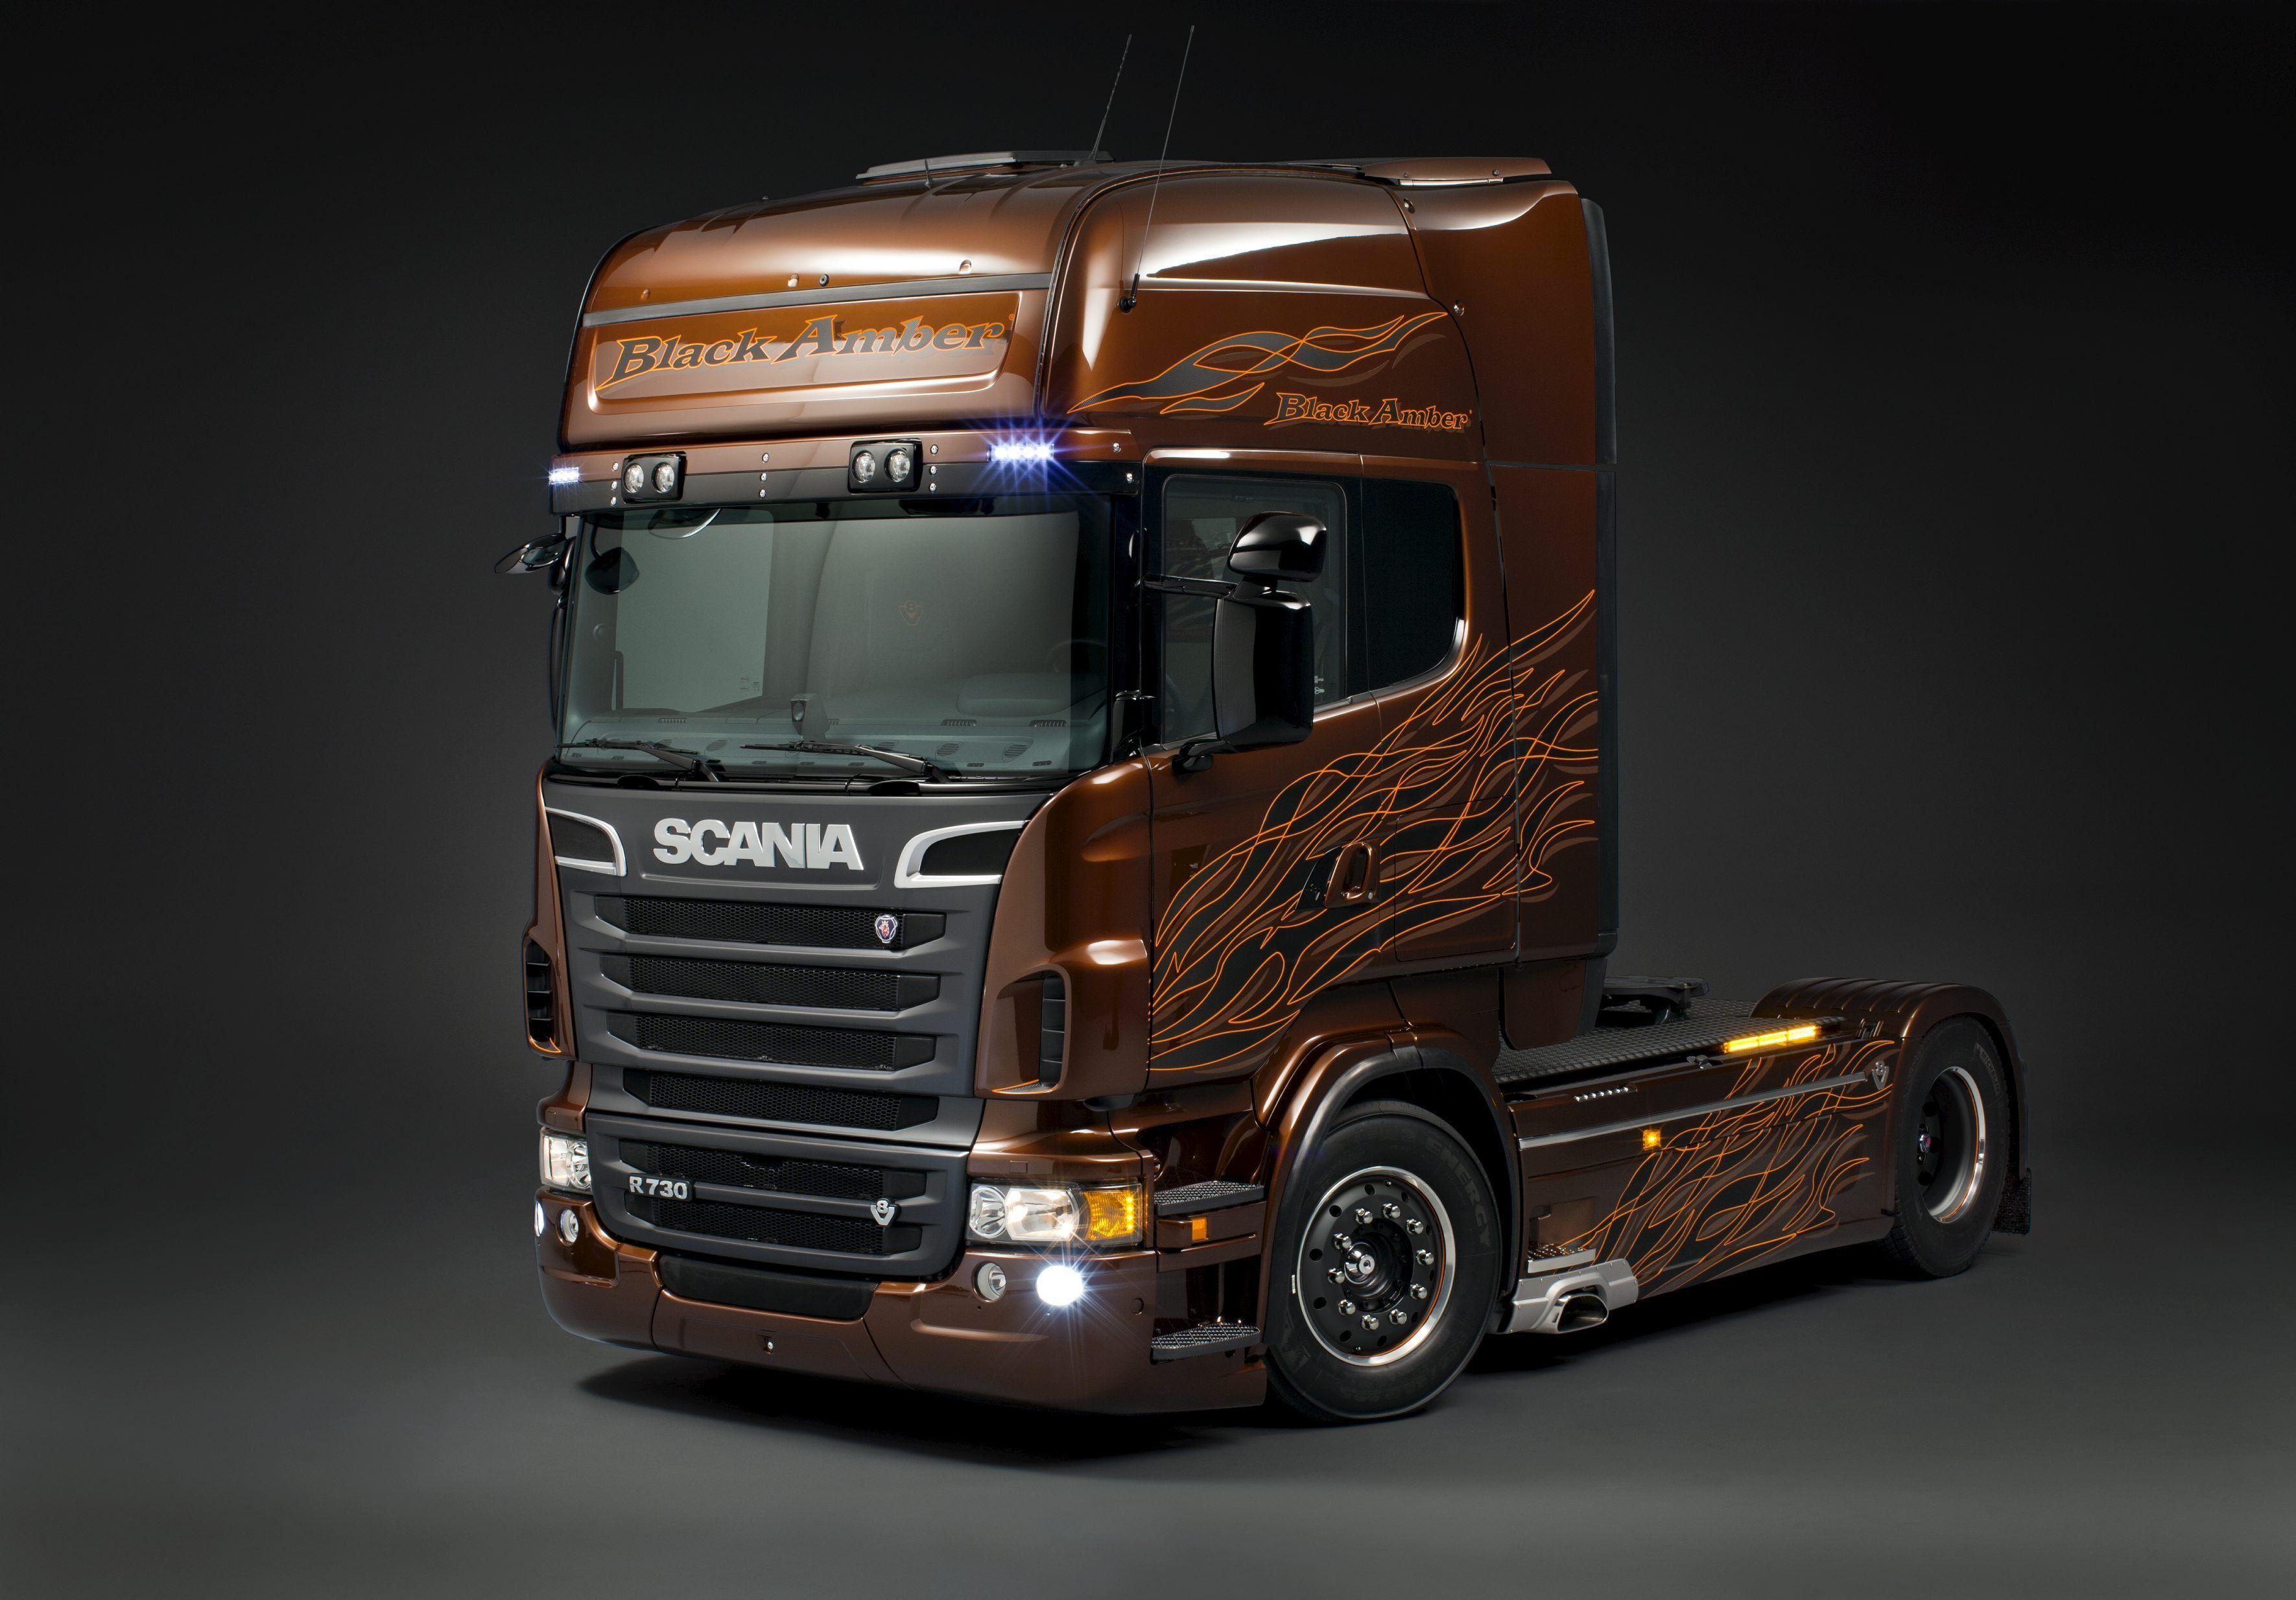 Scania Trucks Wallpapers Wallpaper Cave Scania Truck Truck Scania Cool Trucks